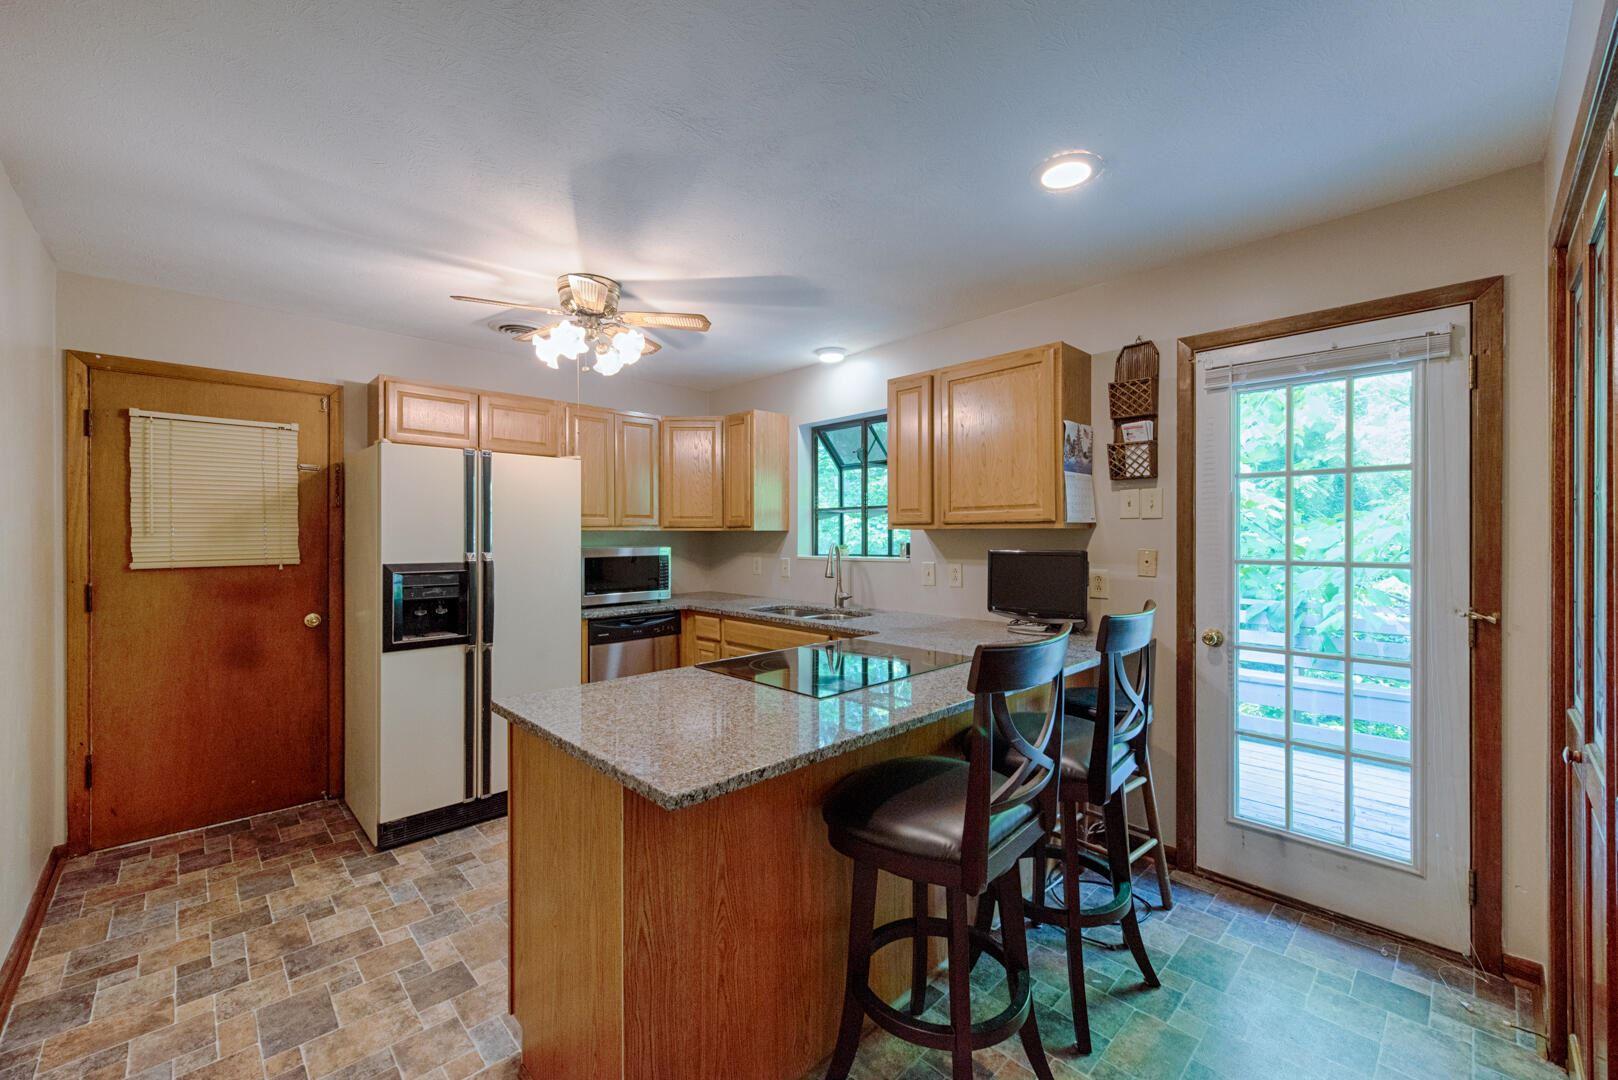 Photo of 119 Nebraska Ave, Oak Ridge, TN 37830 (MLS # 1156450)